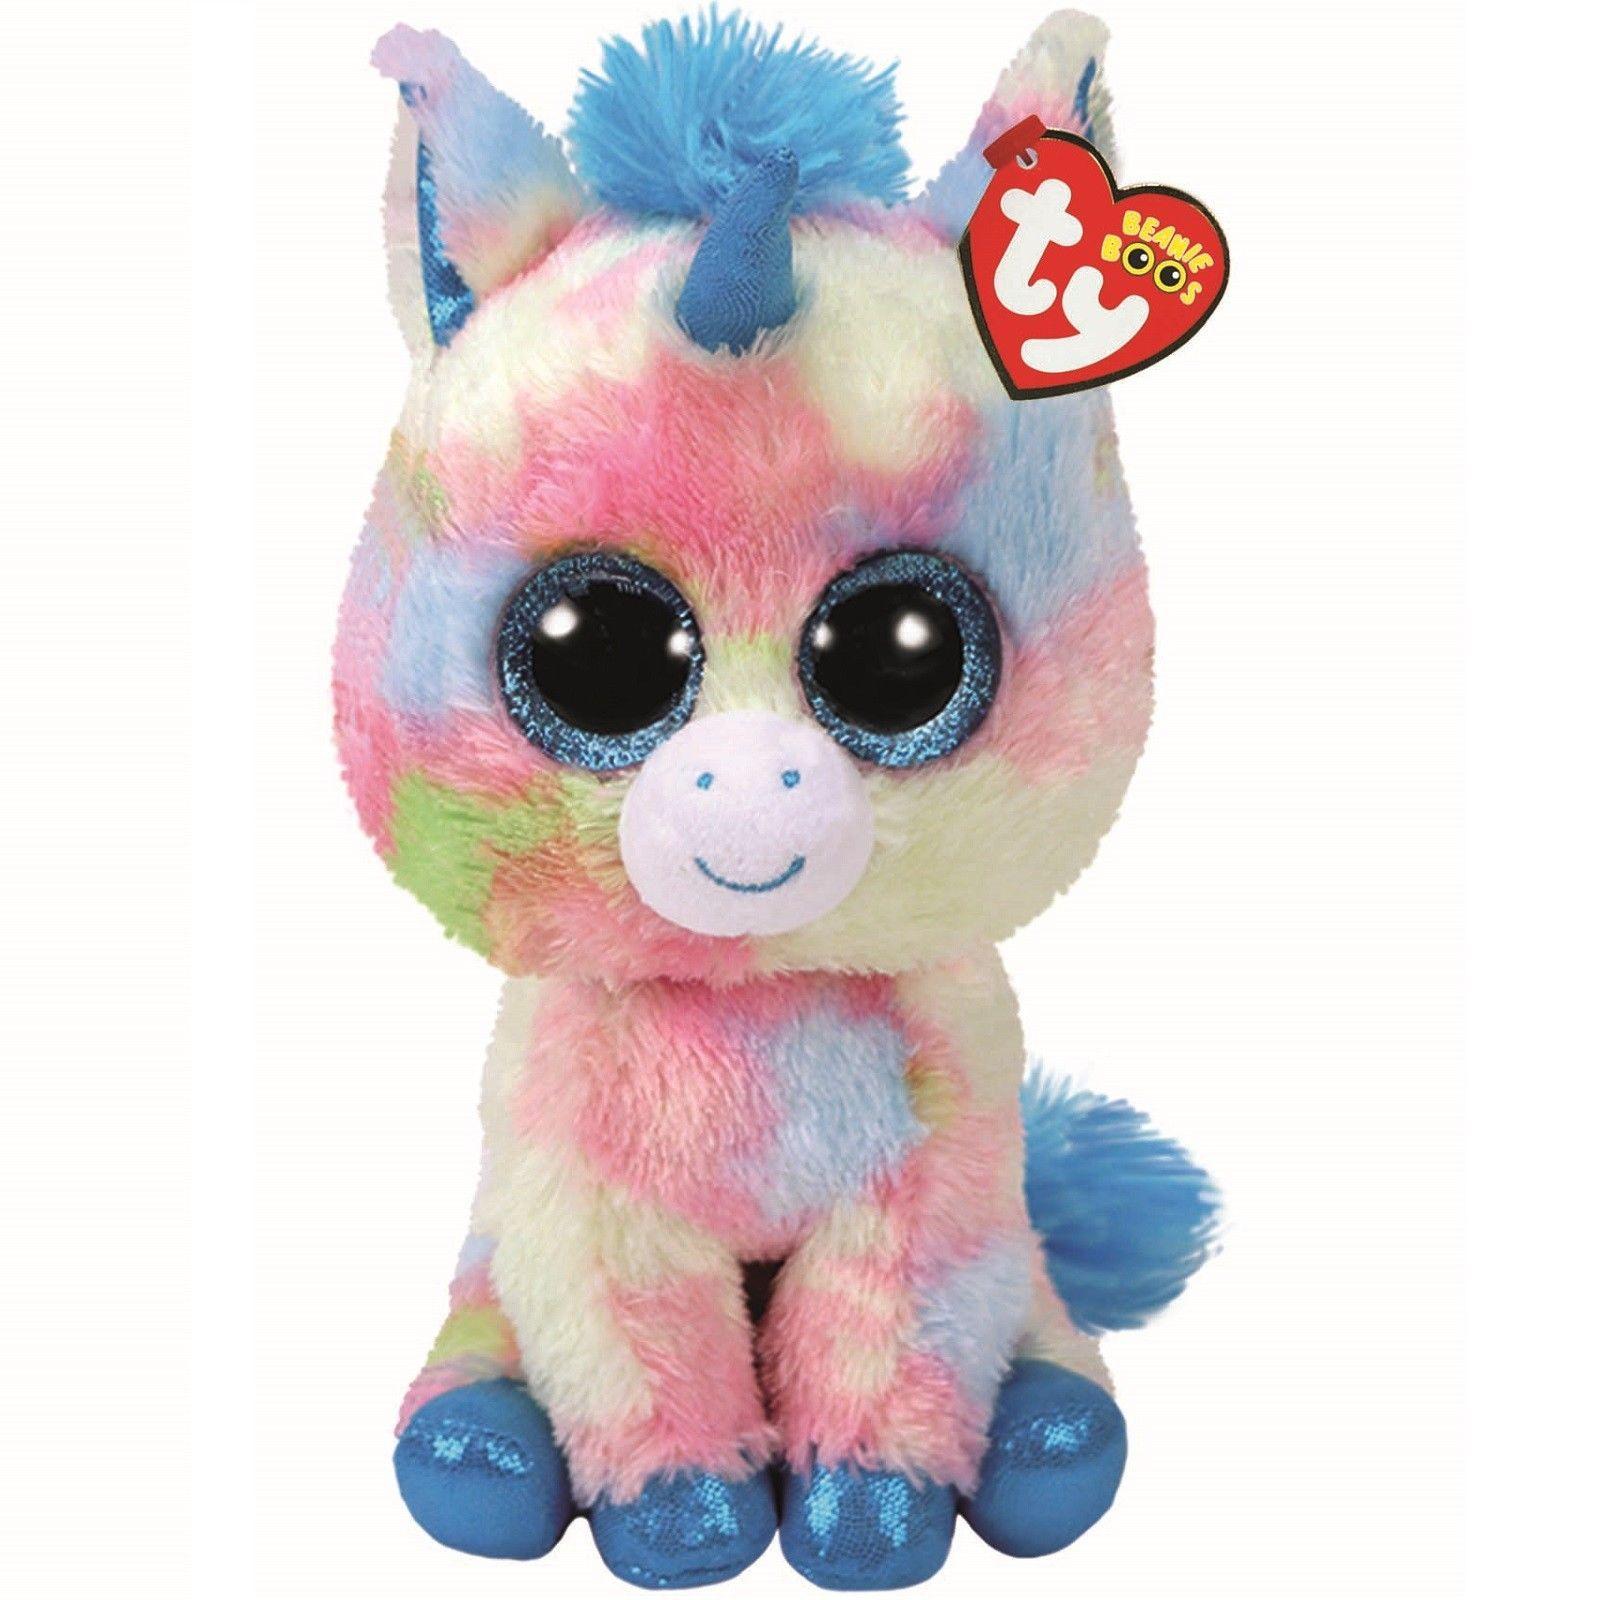 731addcb3ed £9.95 GBP - Ty Beanie Babies Boos 37261 Blitz The Blue Unicorn Boo Buddy   ebay  Collectibles